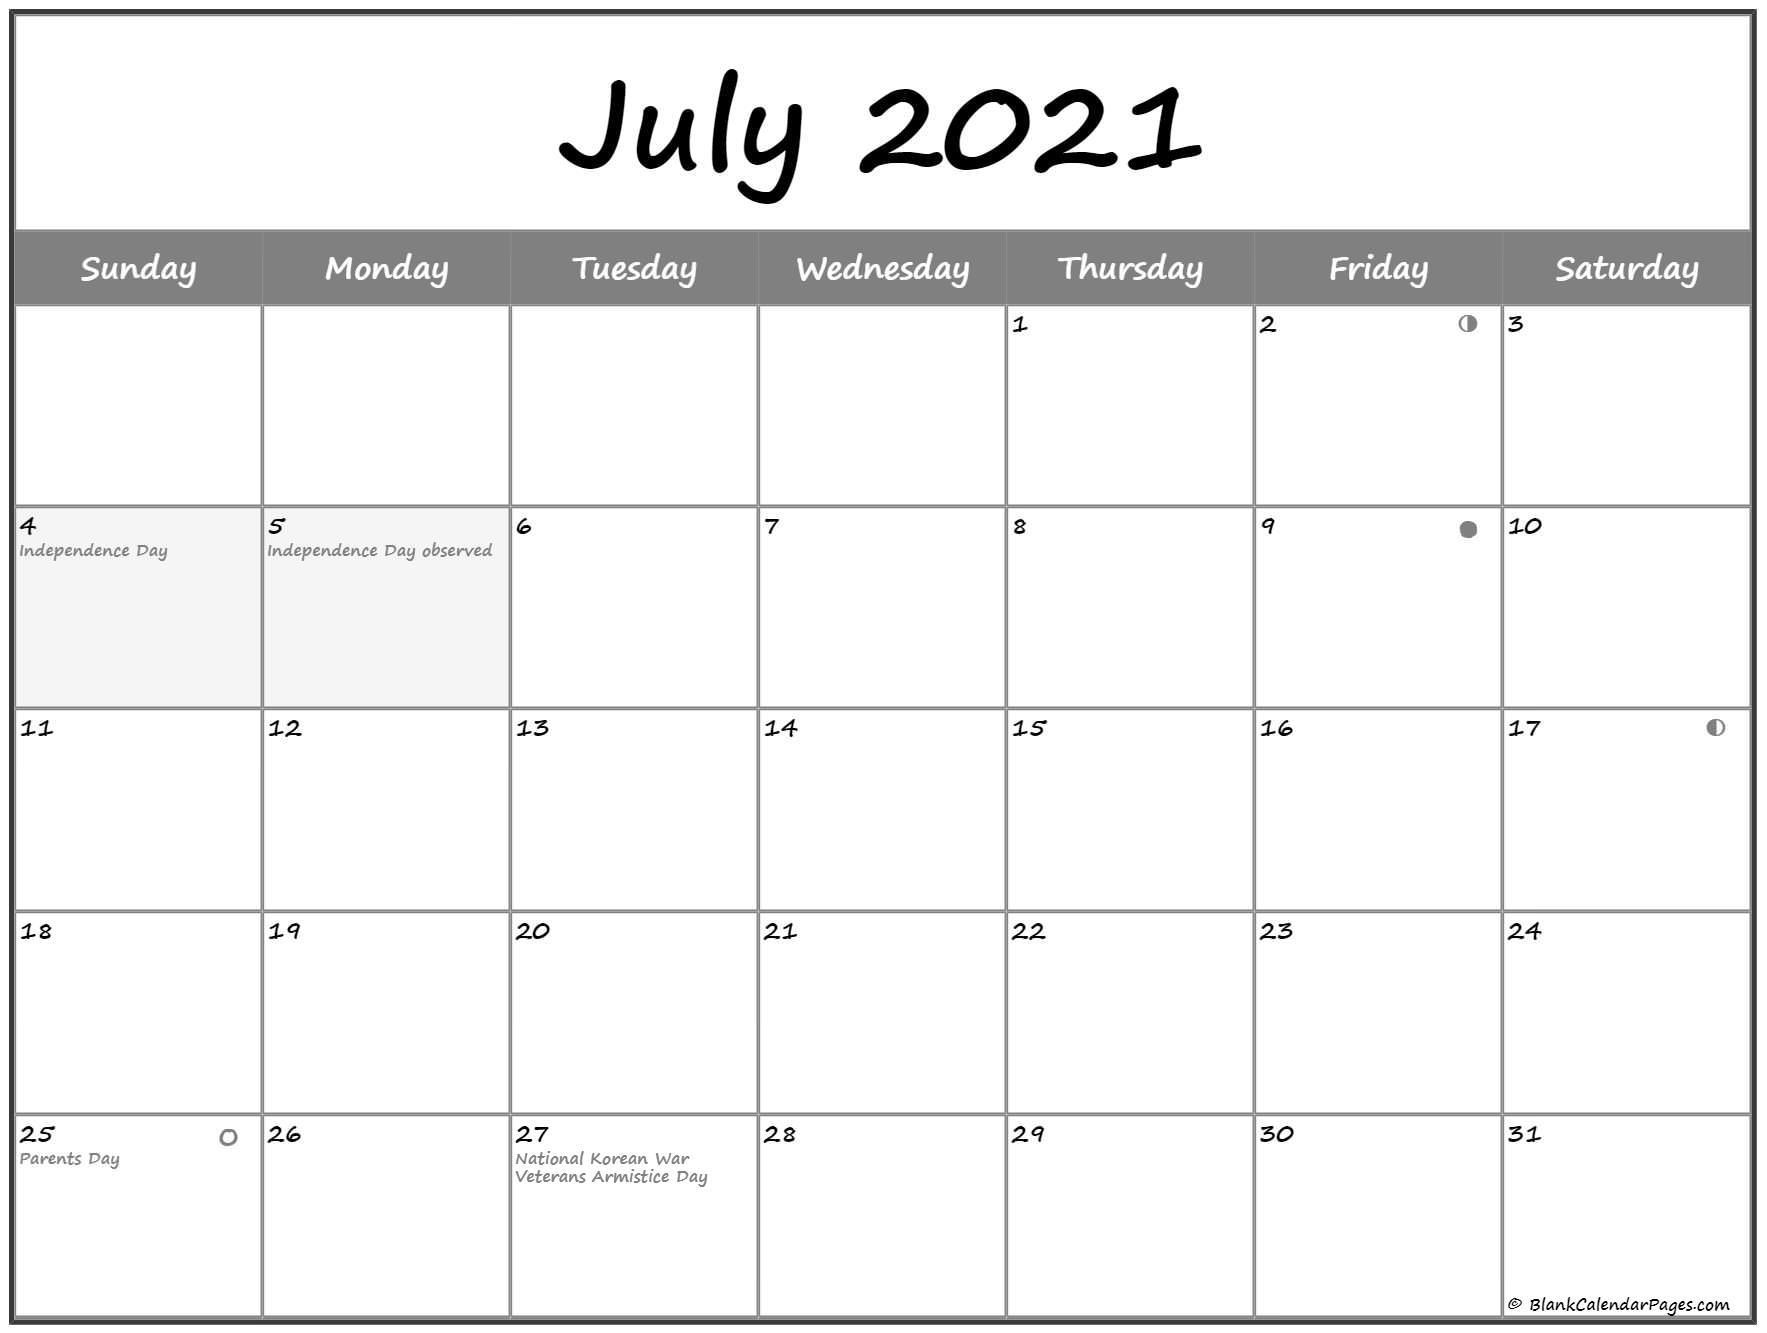 July 2021 Lunar Calendar | Moon Phase Calendar Throughout Moon Phase Deer Hunting Chart 2021